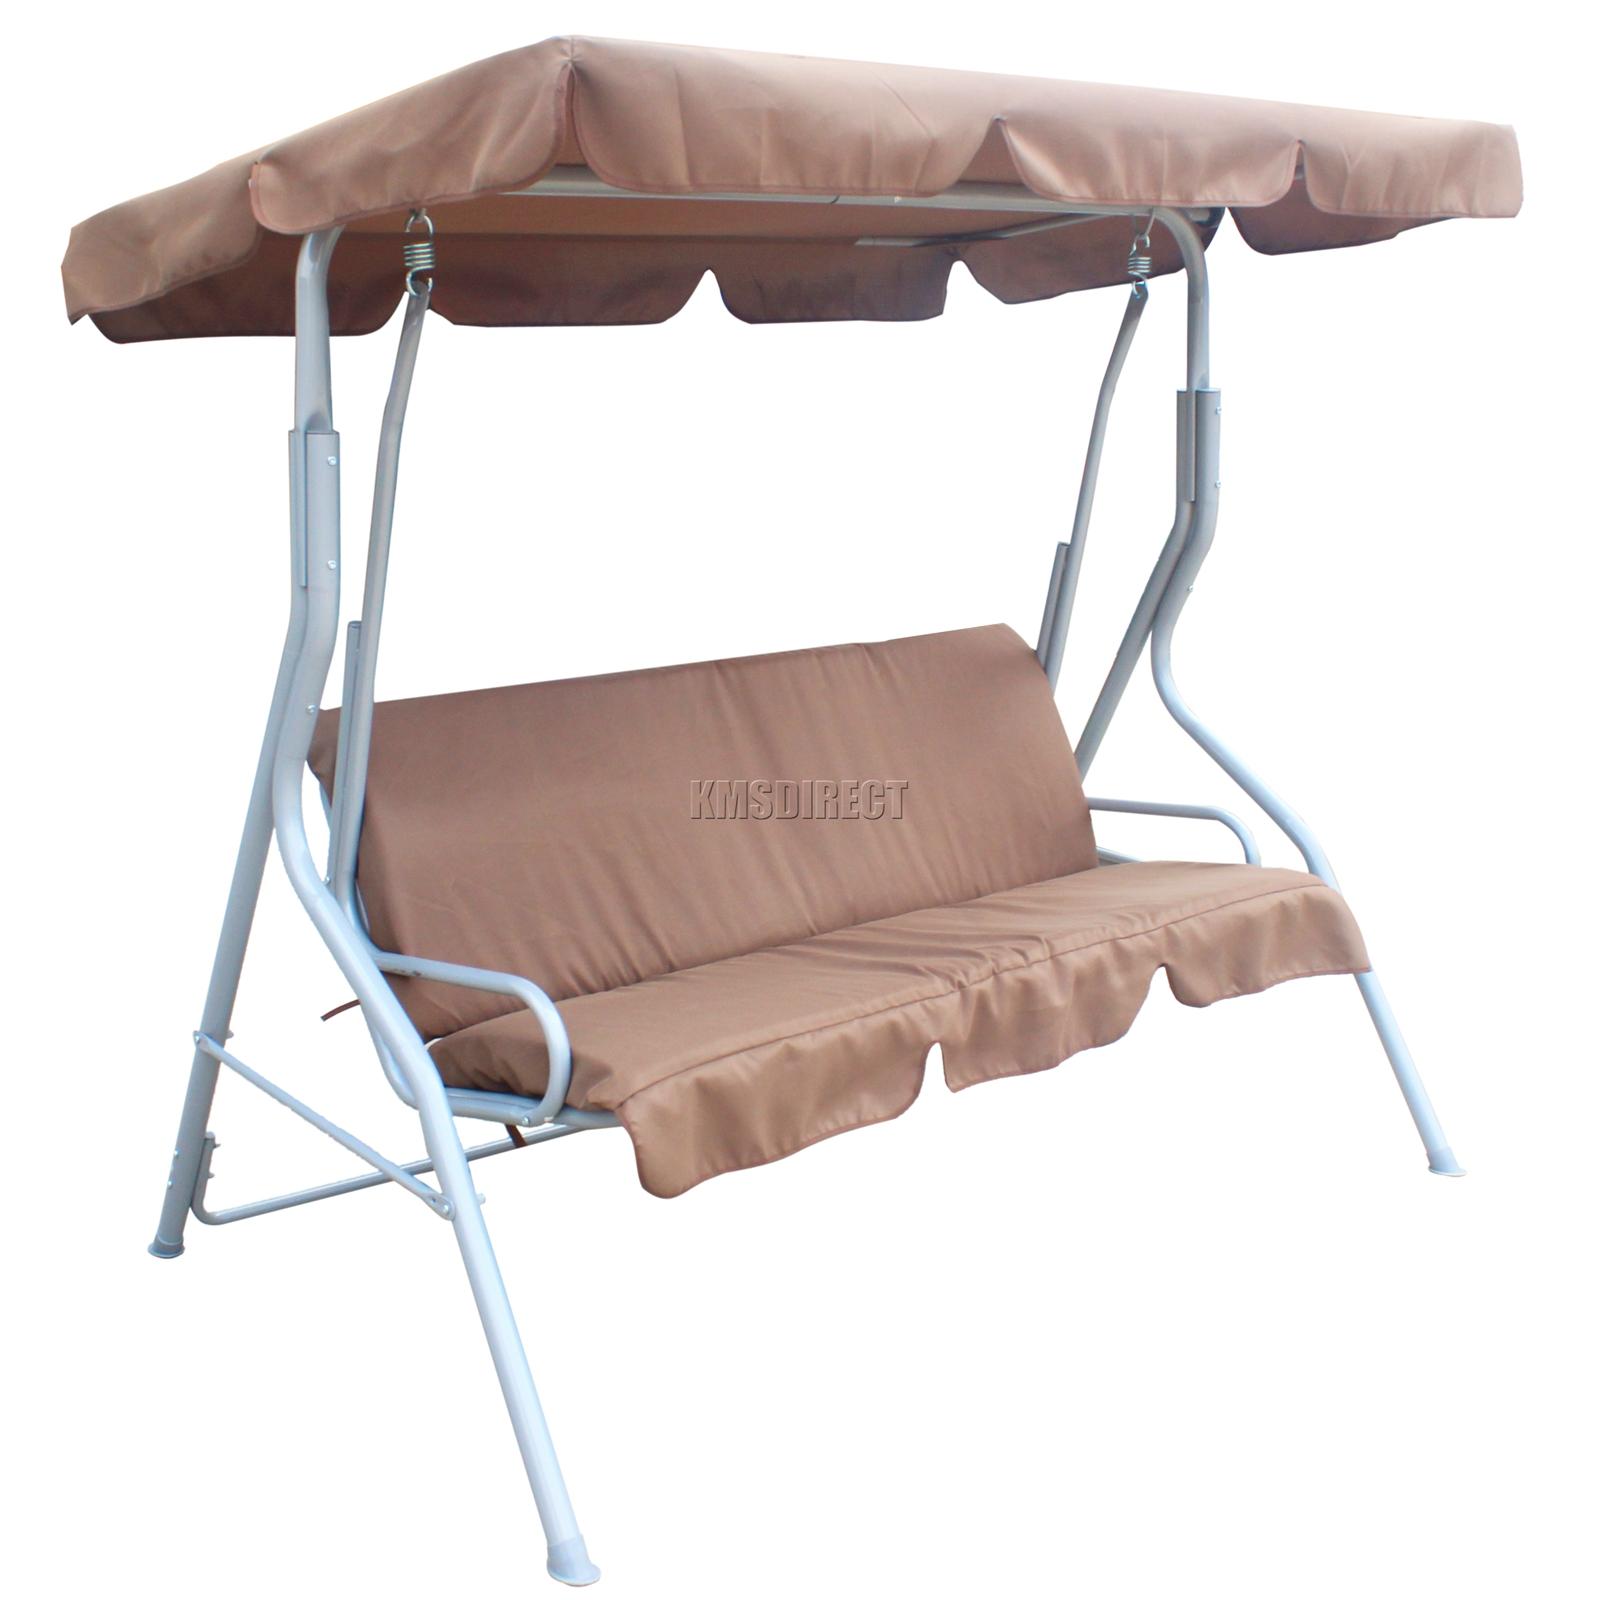 Treasures 3 Seat Steel Casual Swing Replacement Canopy Seater Garden Hammock  Cushions Source Patio Lawson Ridge